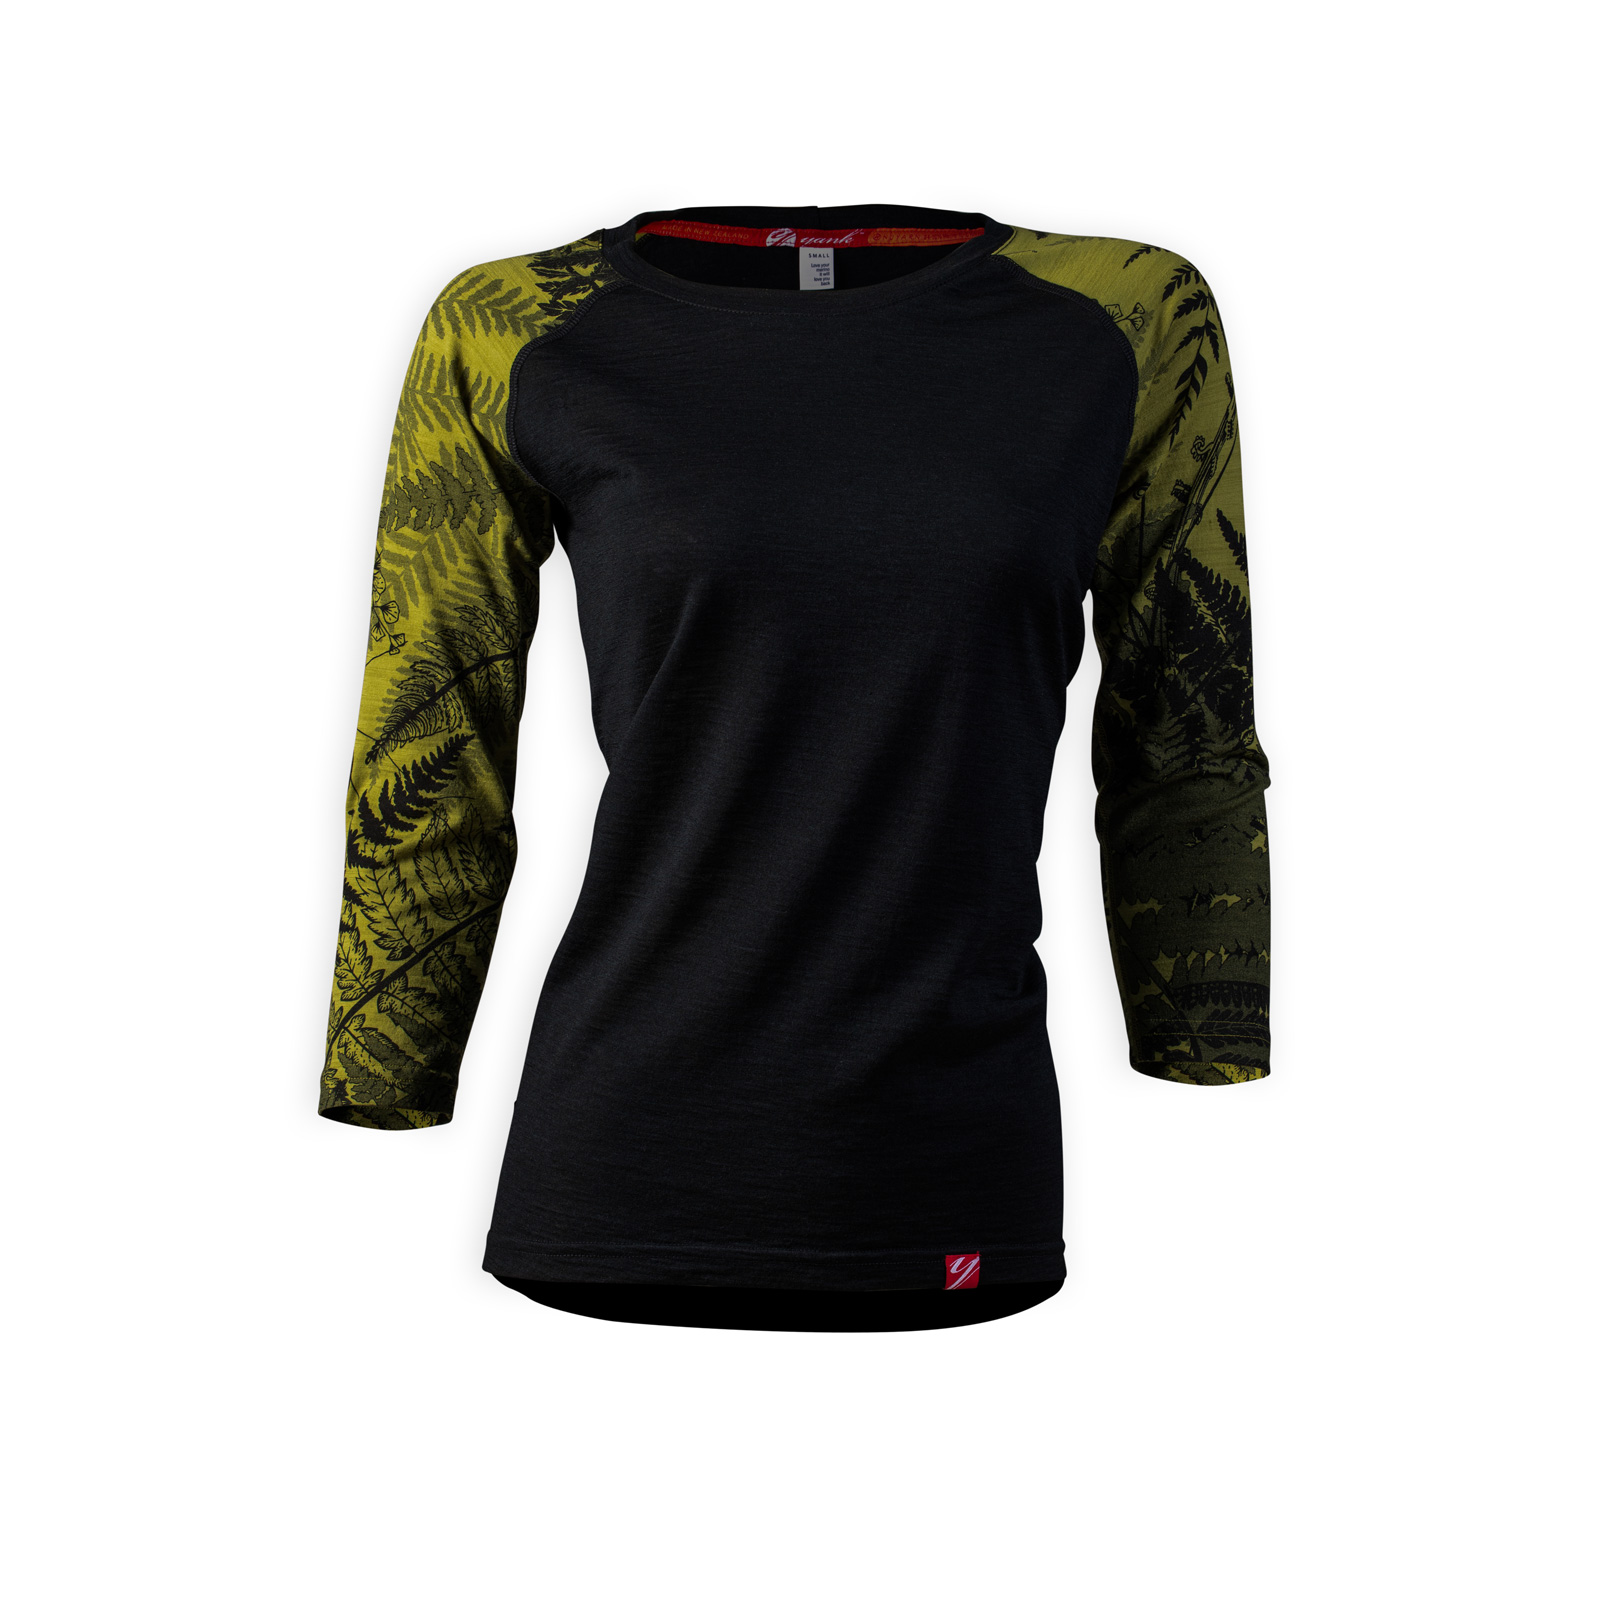 Women's Trace 3/4 Sleeve Merino Shirt | Flora Moss